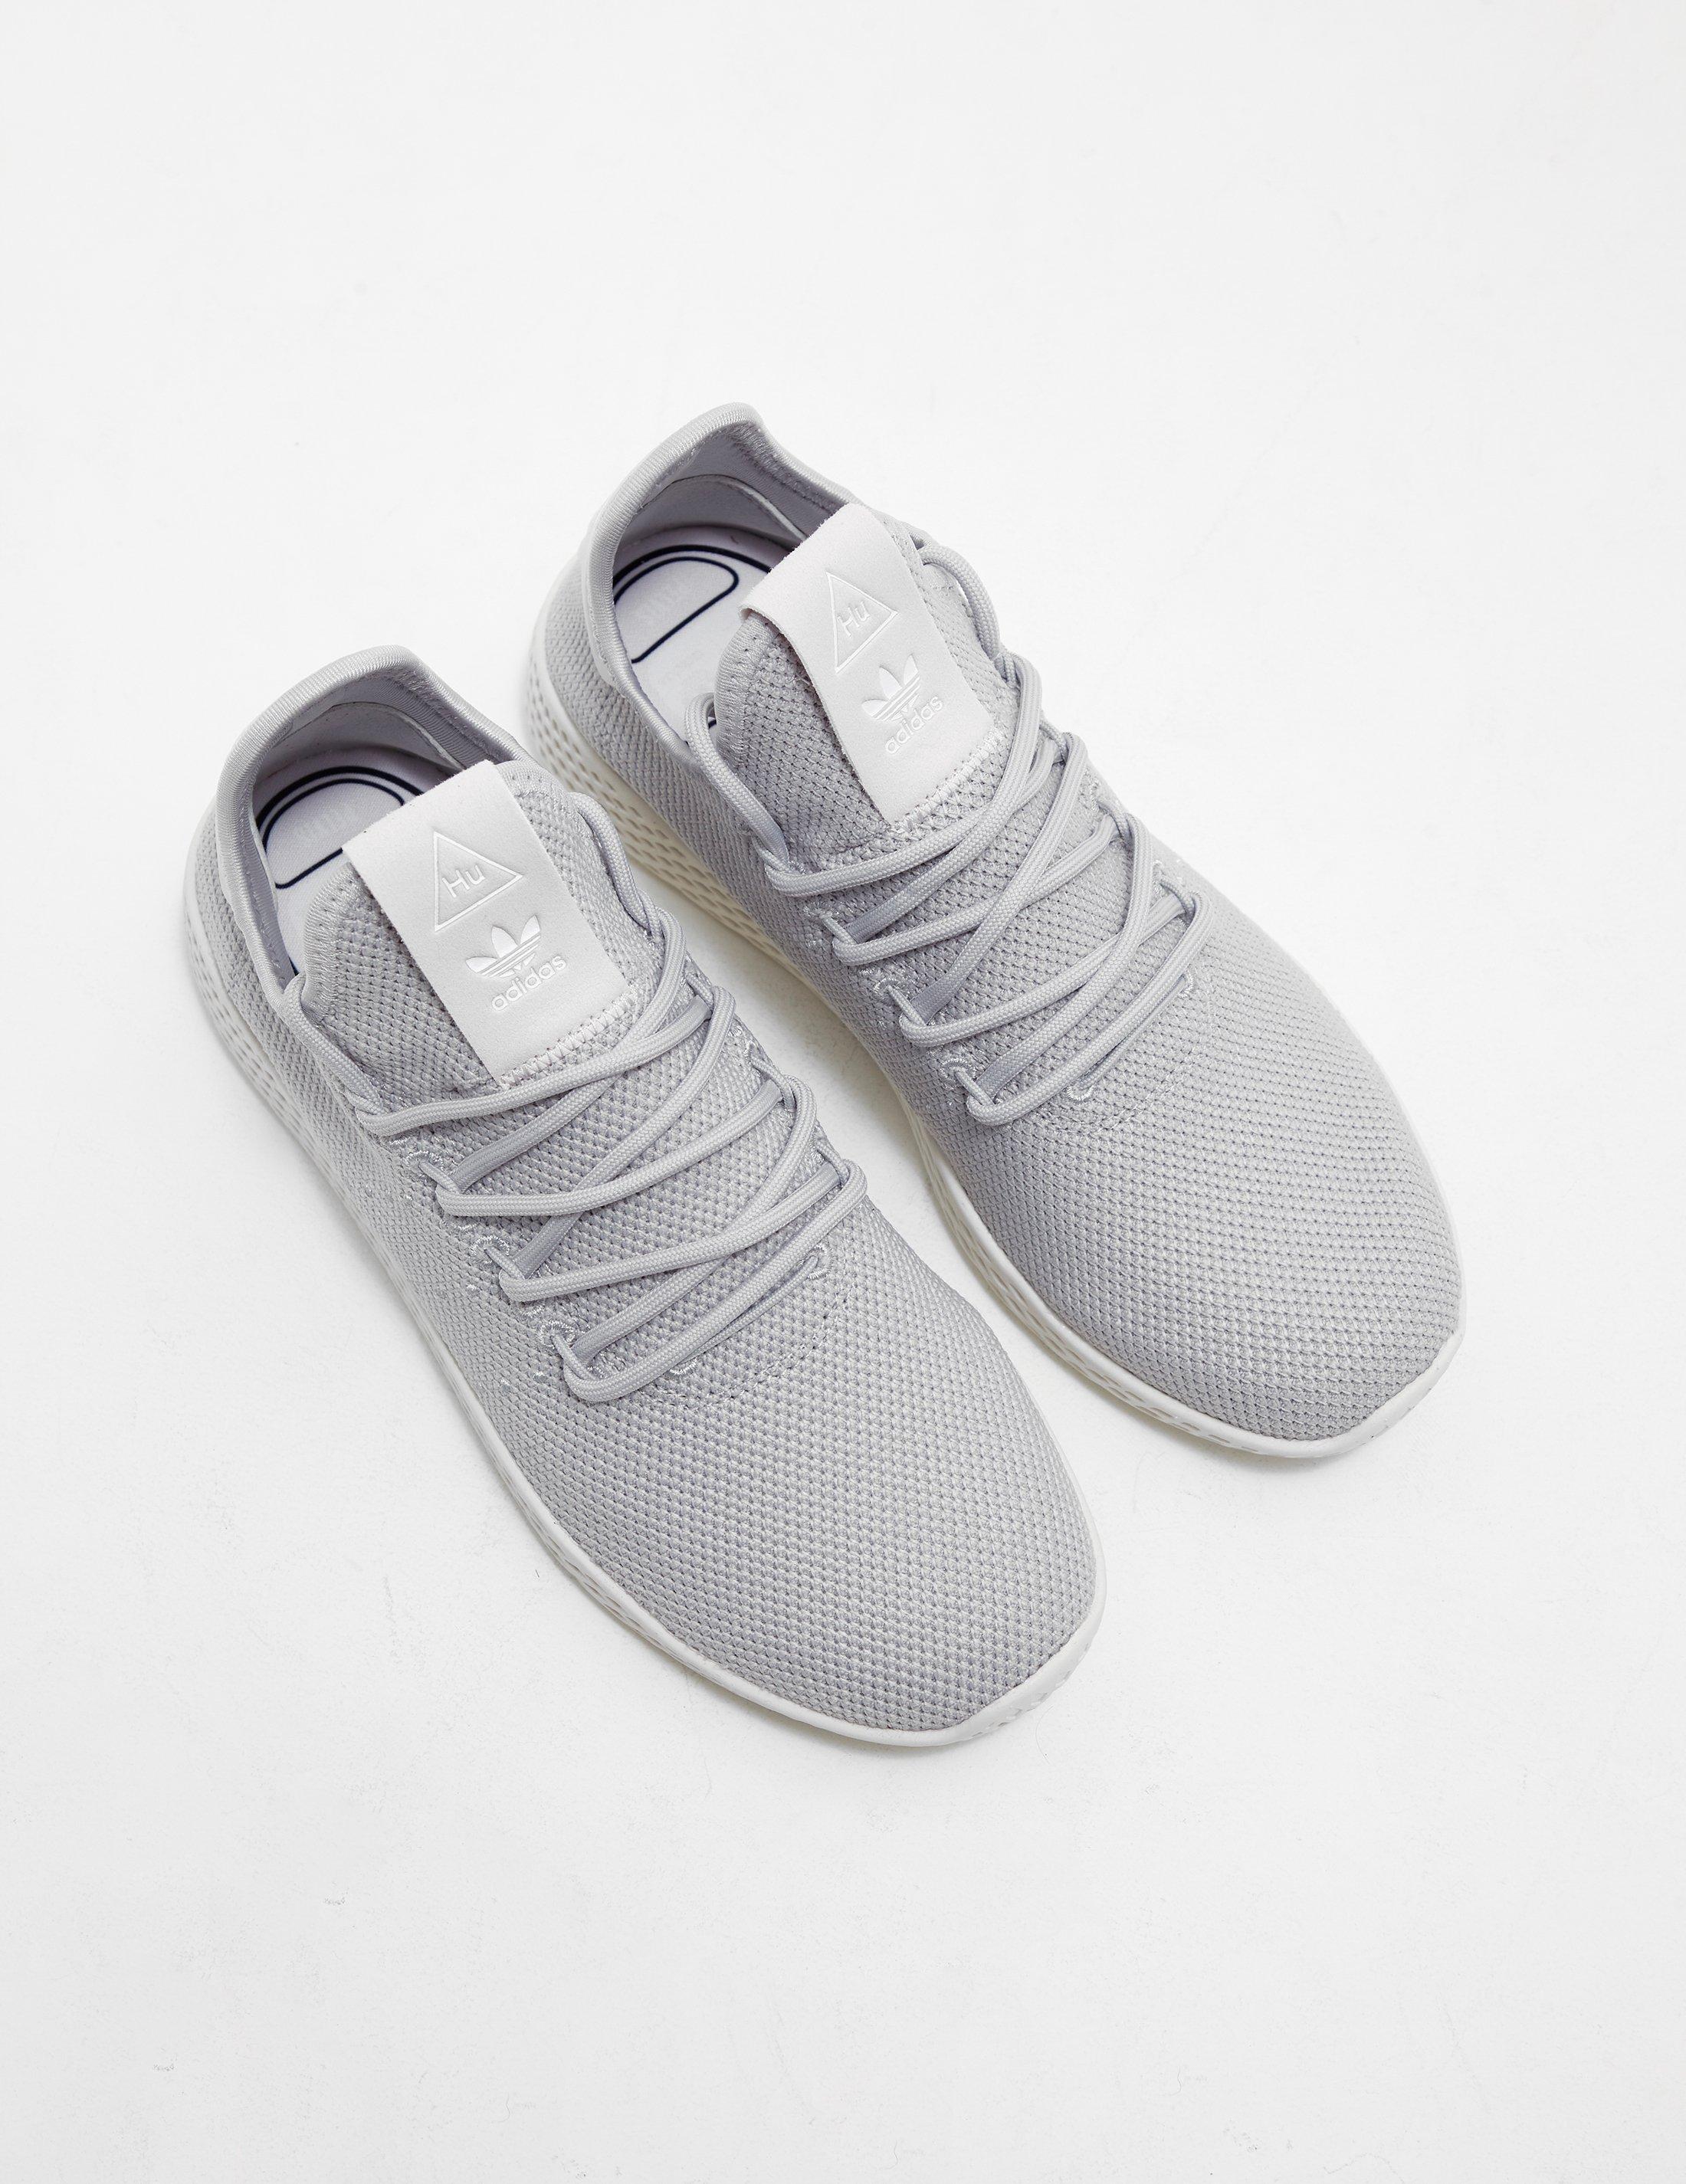 grey adidas ladies trainers